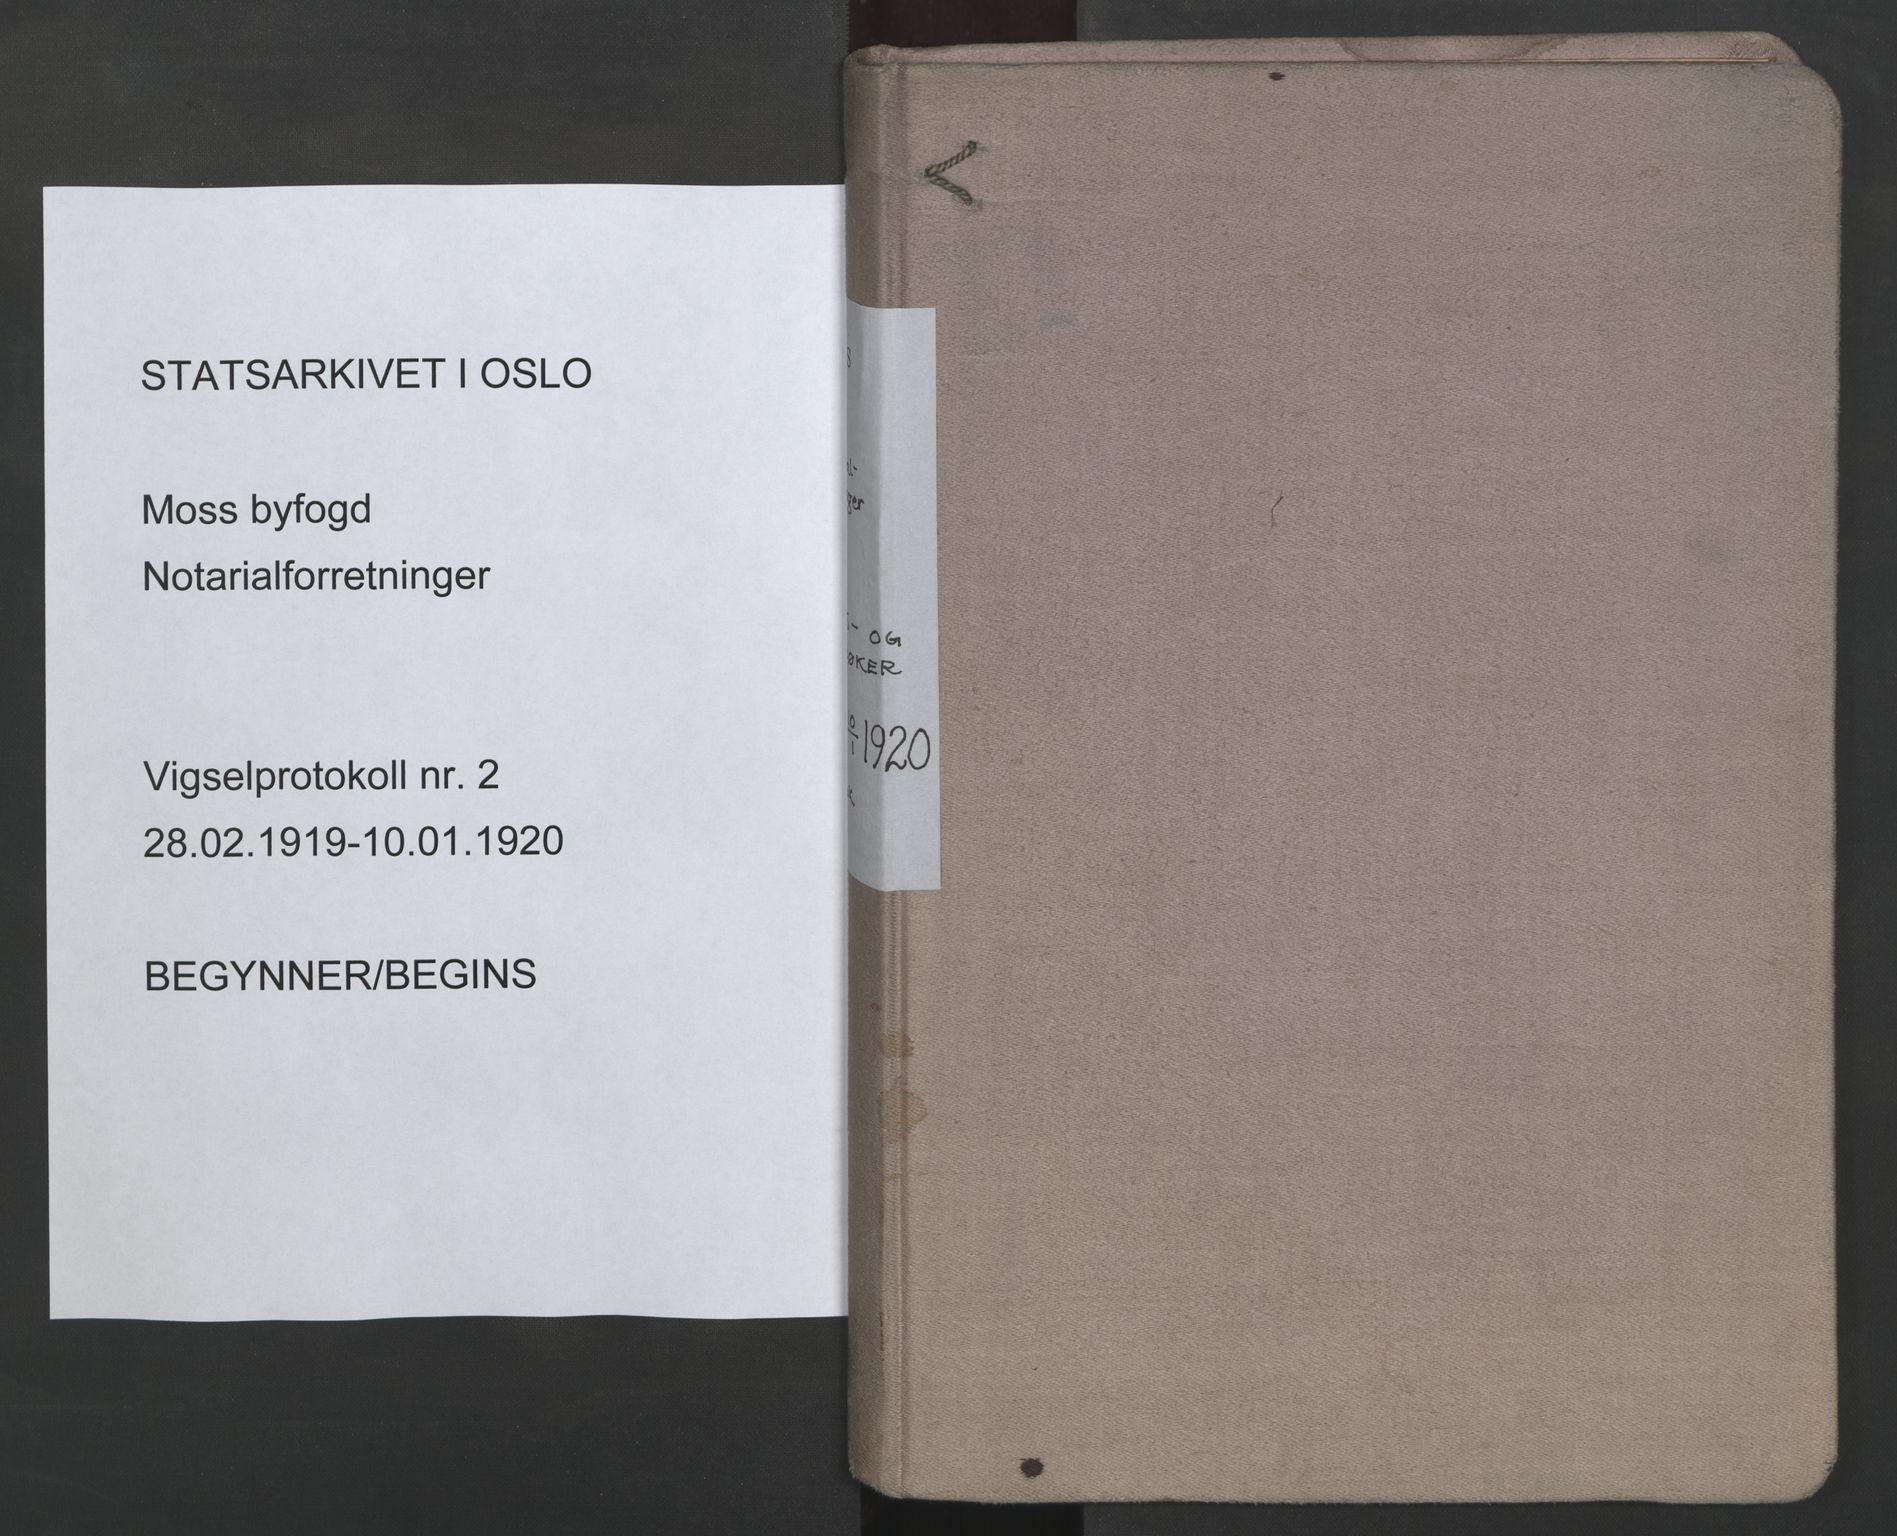 SAO, Moss byfogd, L/Lb/L0002: Vigselsbok, 1919-1920, s. upaginert